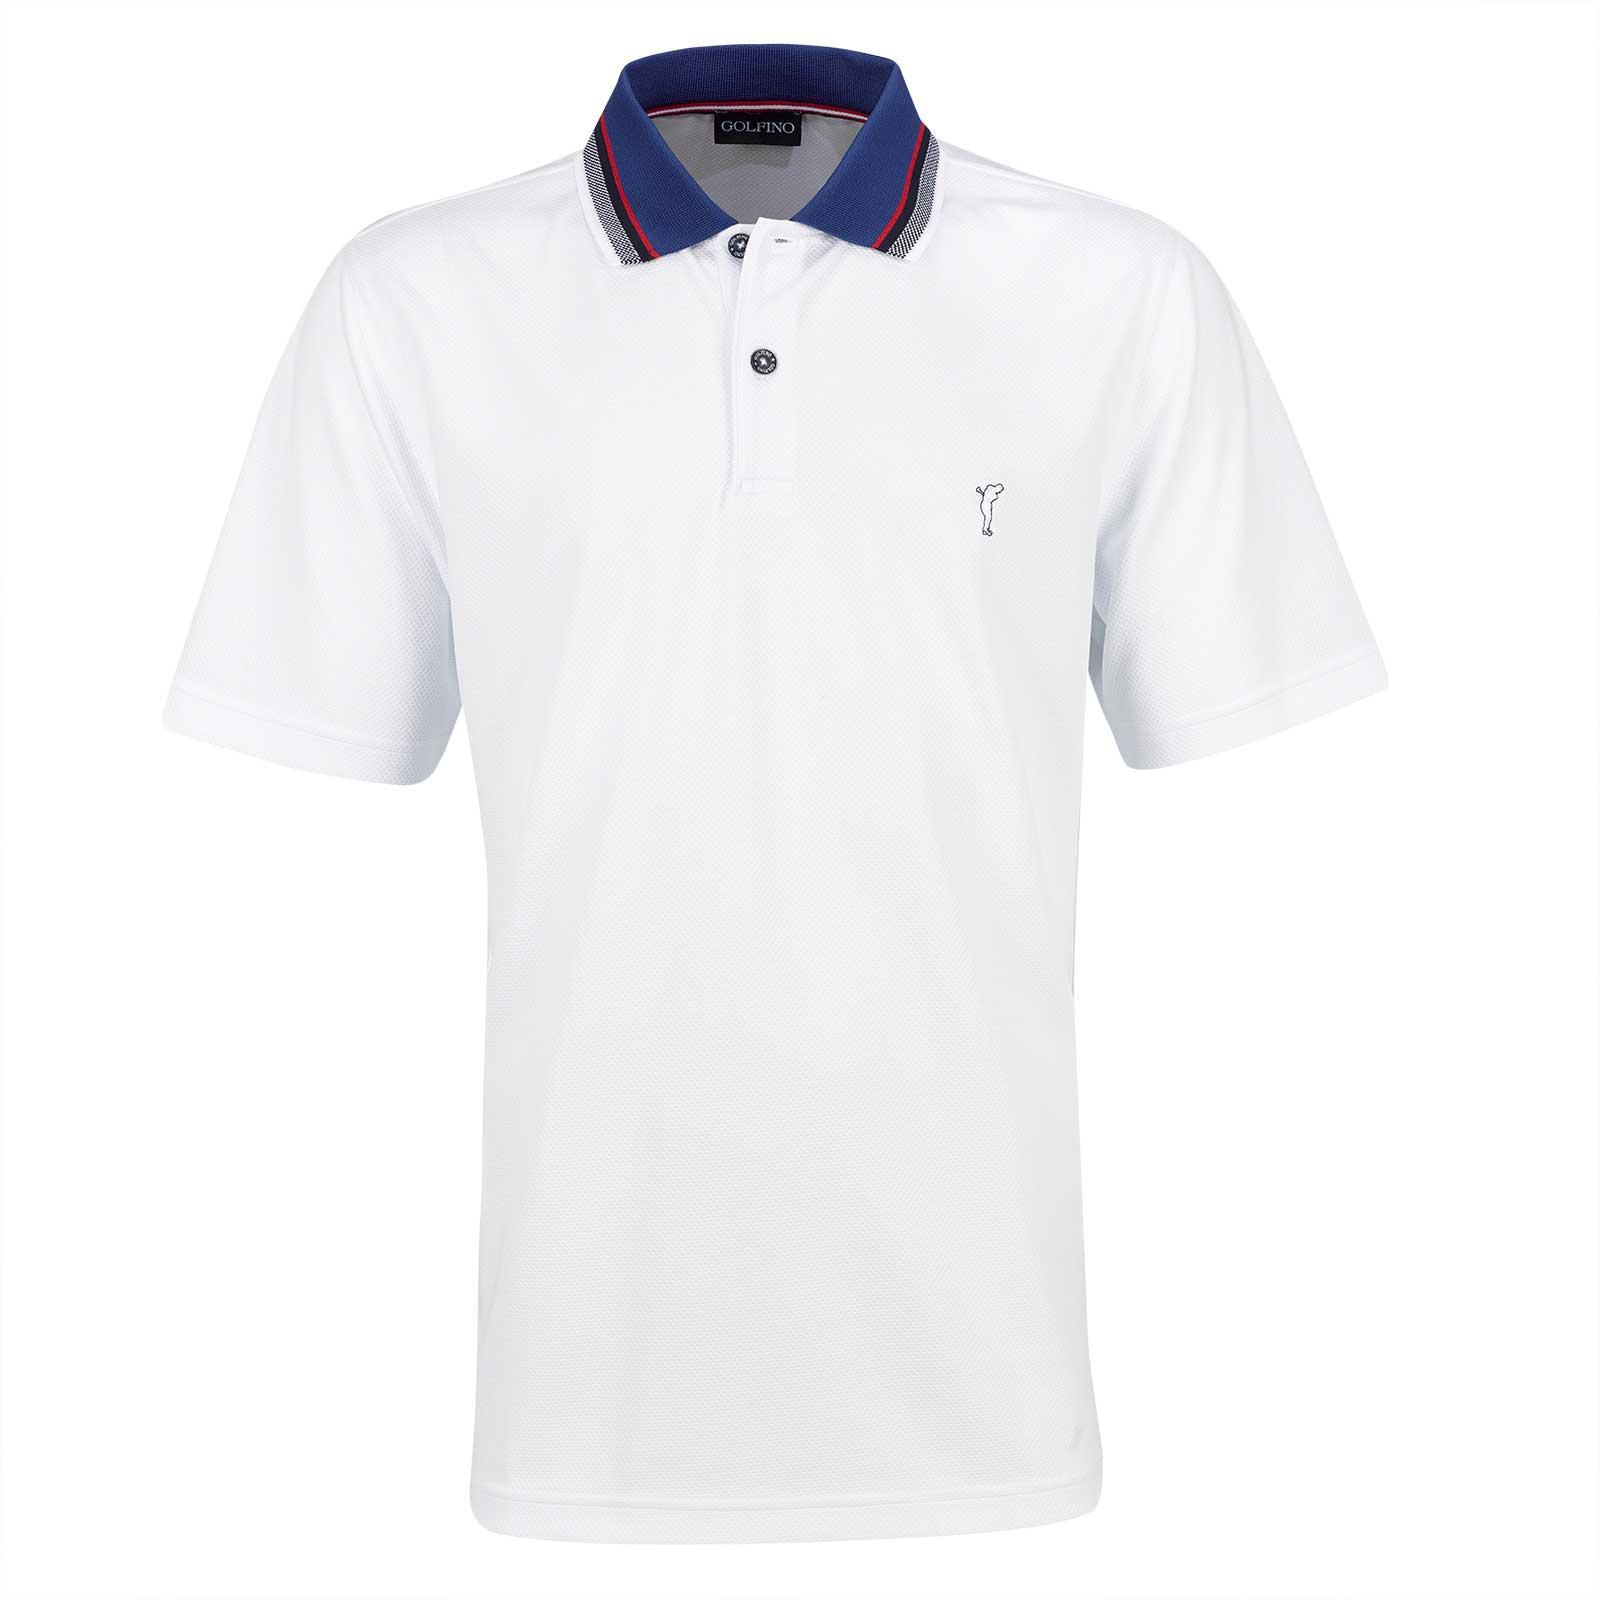 Herren Kurzarm Golfpolo aus Kafetex® Material mit Moisture Management